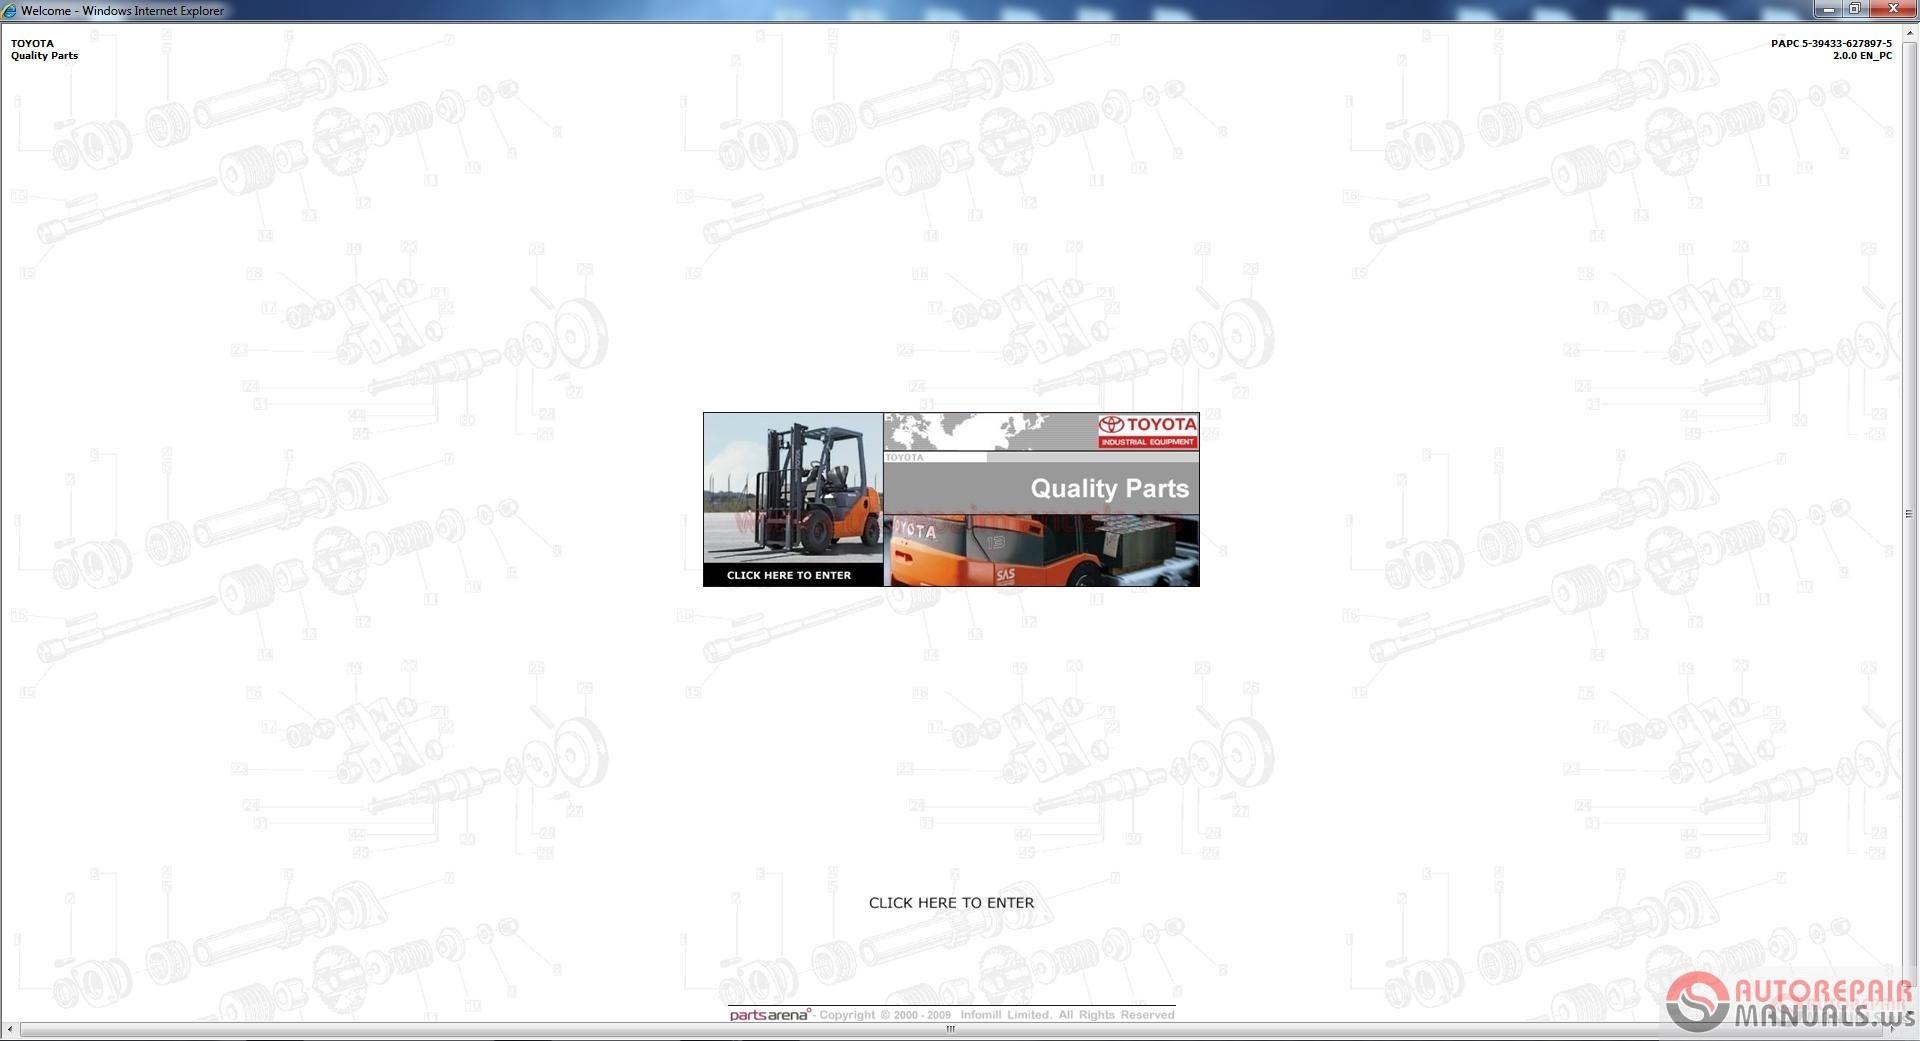 Toyota forklift bt arena epc parts catalogue auto repair manual fbesf101215 30 fbm16 fbm16 fbm16 fbm2025 30 fbm20 30 fbm25 fbm20 fbm25 fbm30 fbmf16 fbmf2025 fbmf20 fbmf25 fbmf30 sciox Choice Image